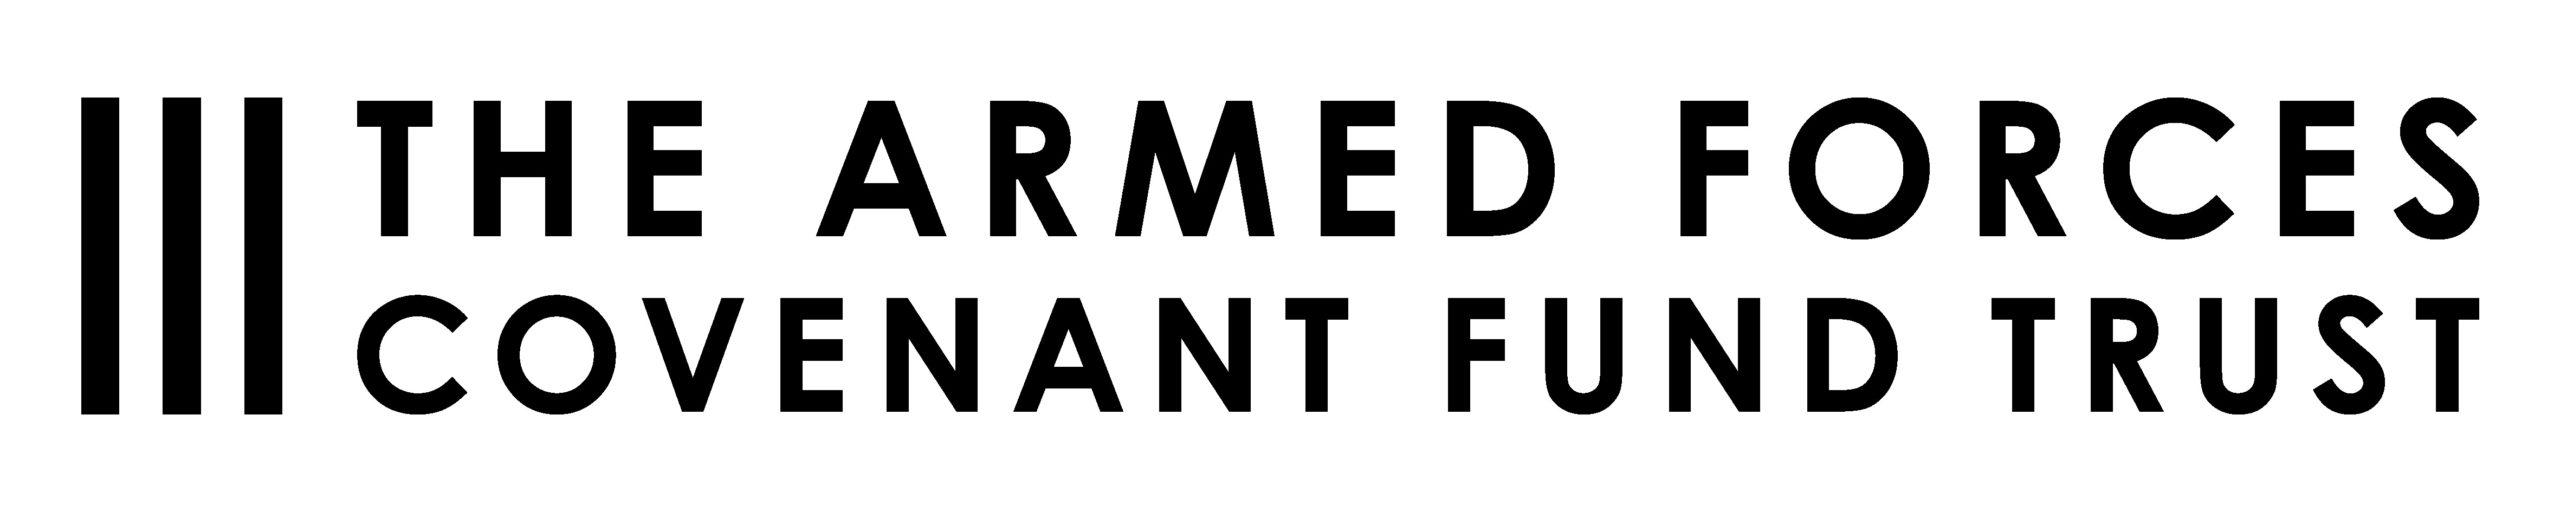 Armed Forces Covenant Fund Trust logo, black